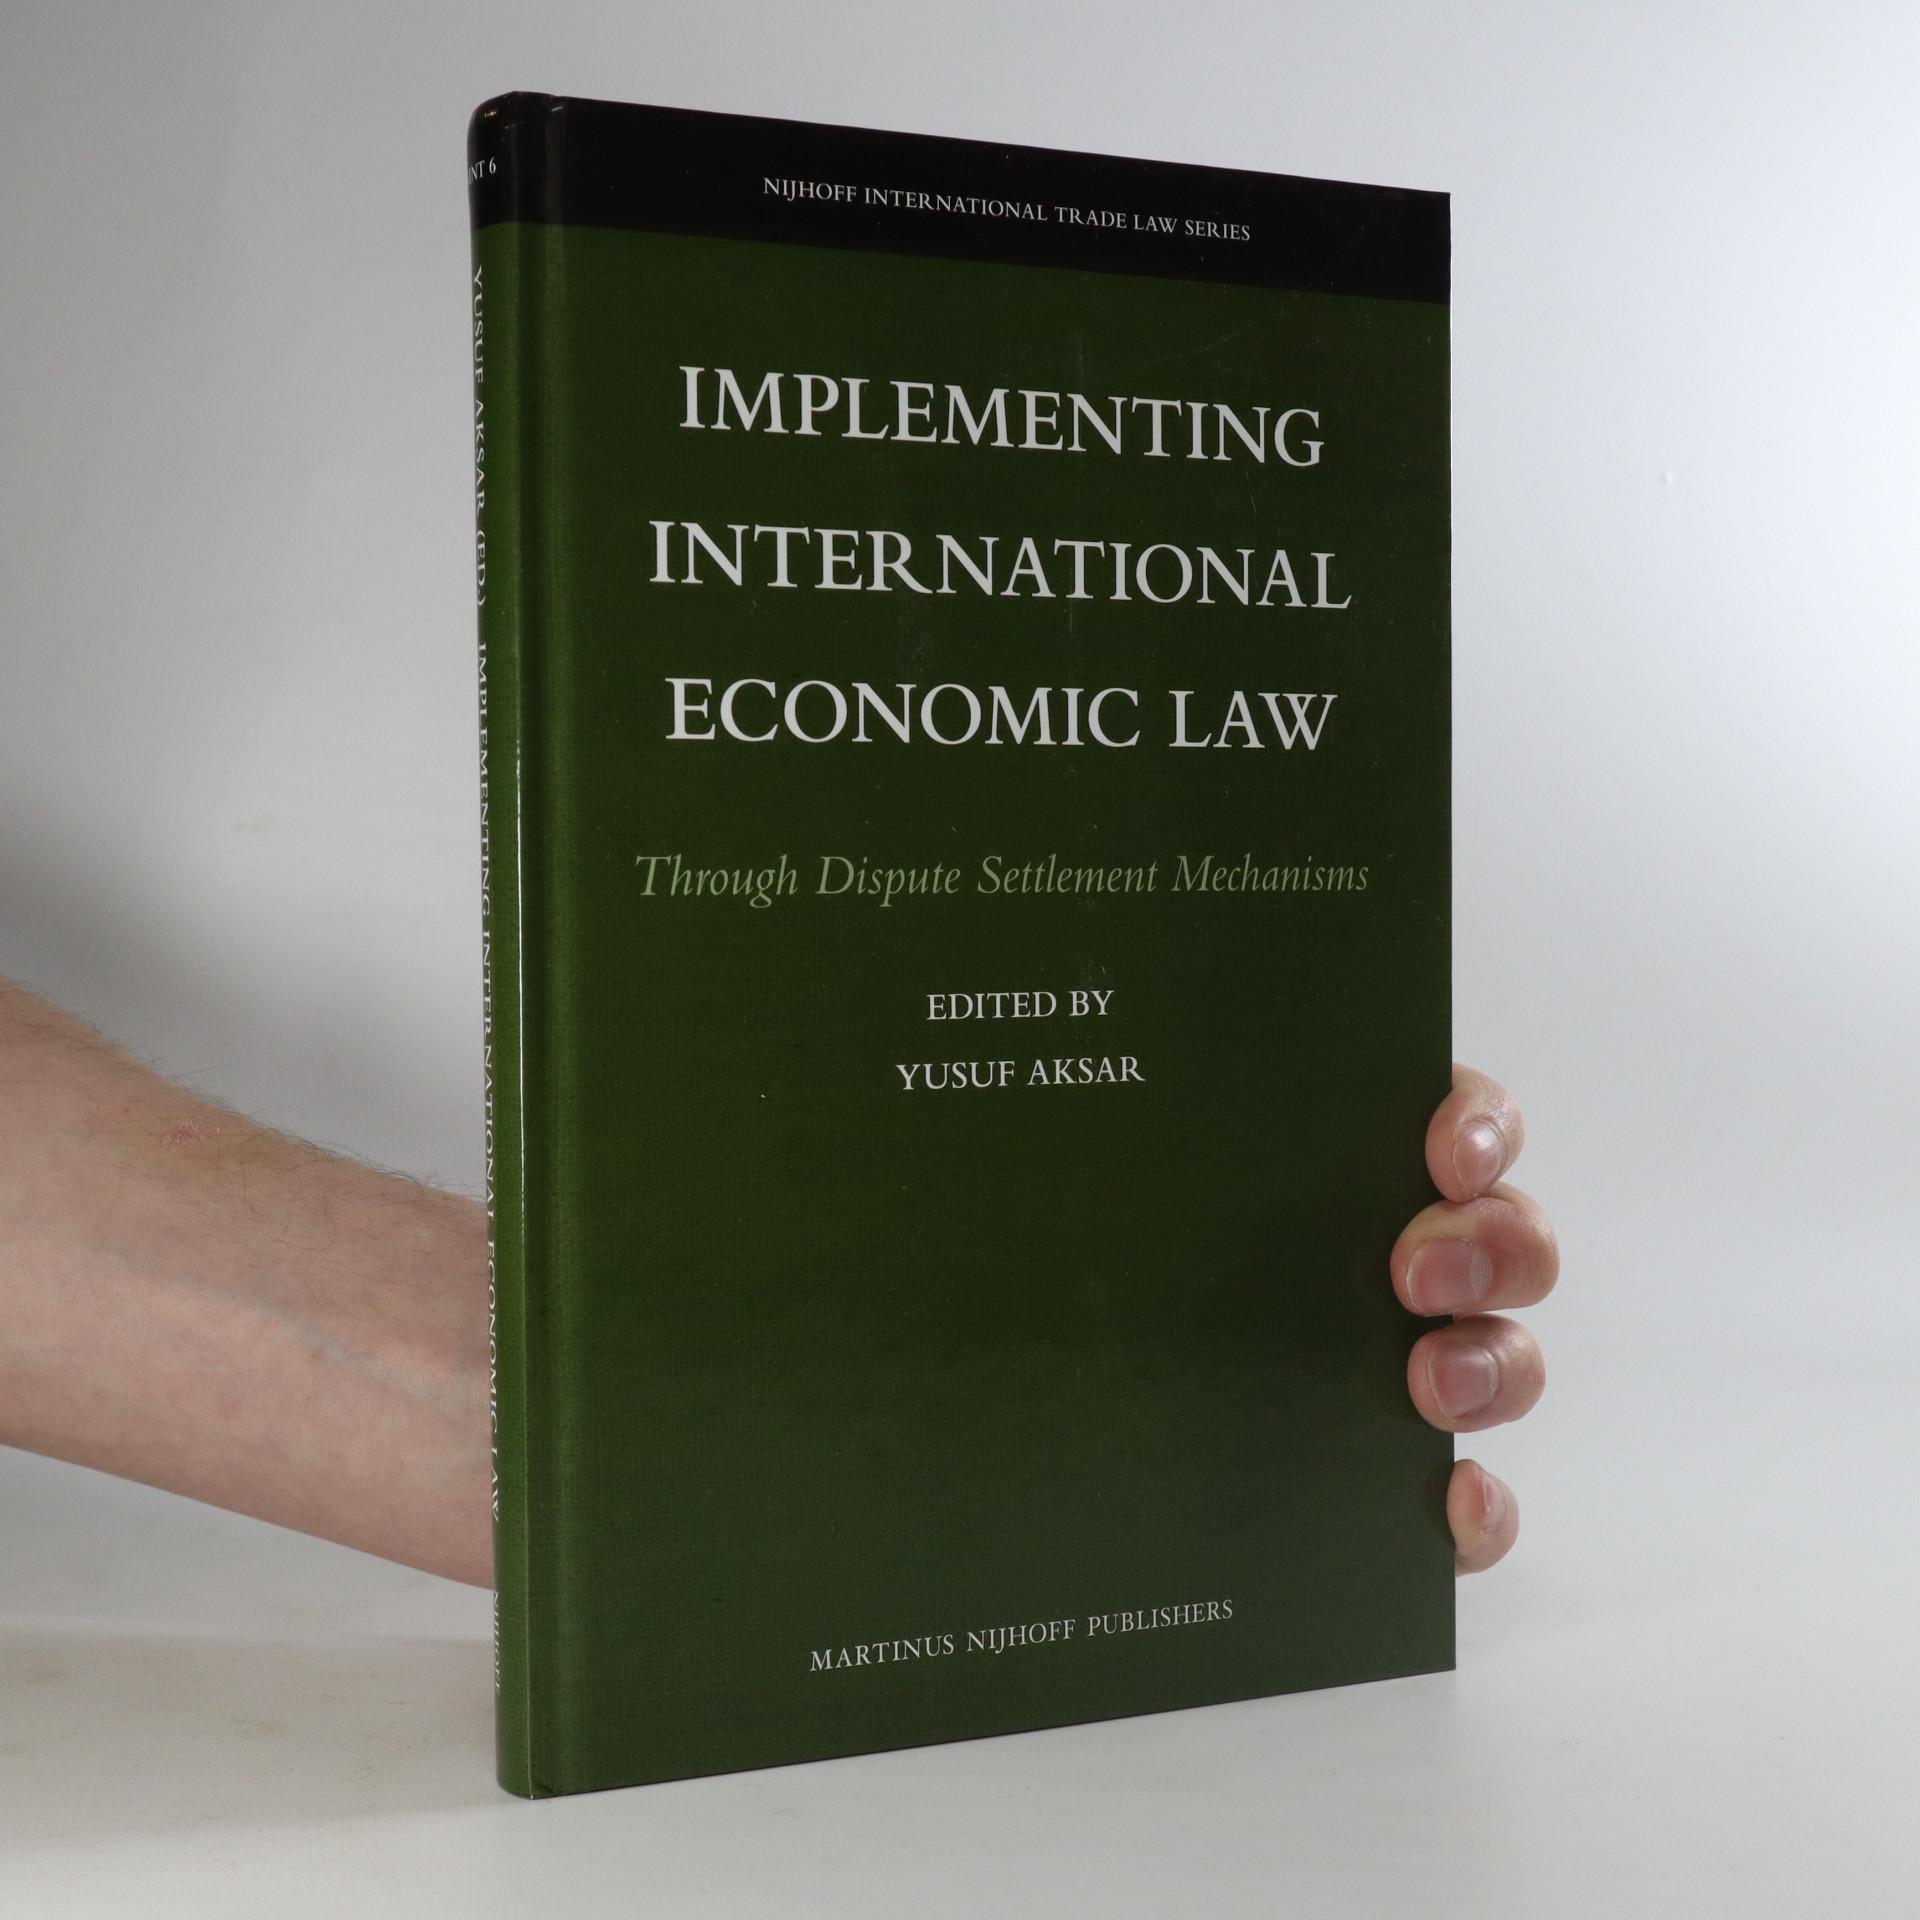 antikvární kniha Implementing international economic law through dispute settlement mechanisms, neuveden